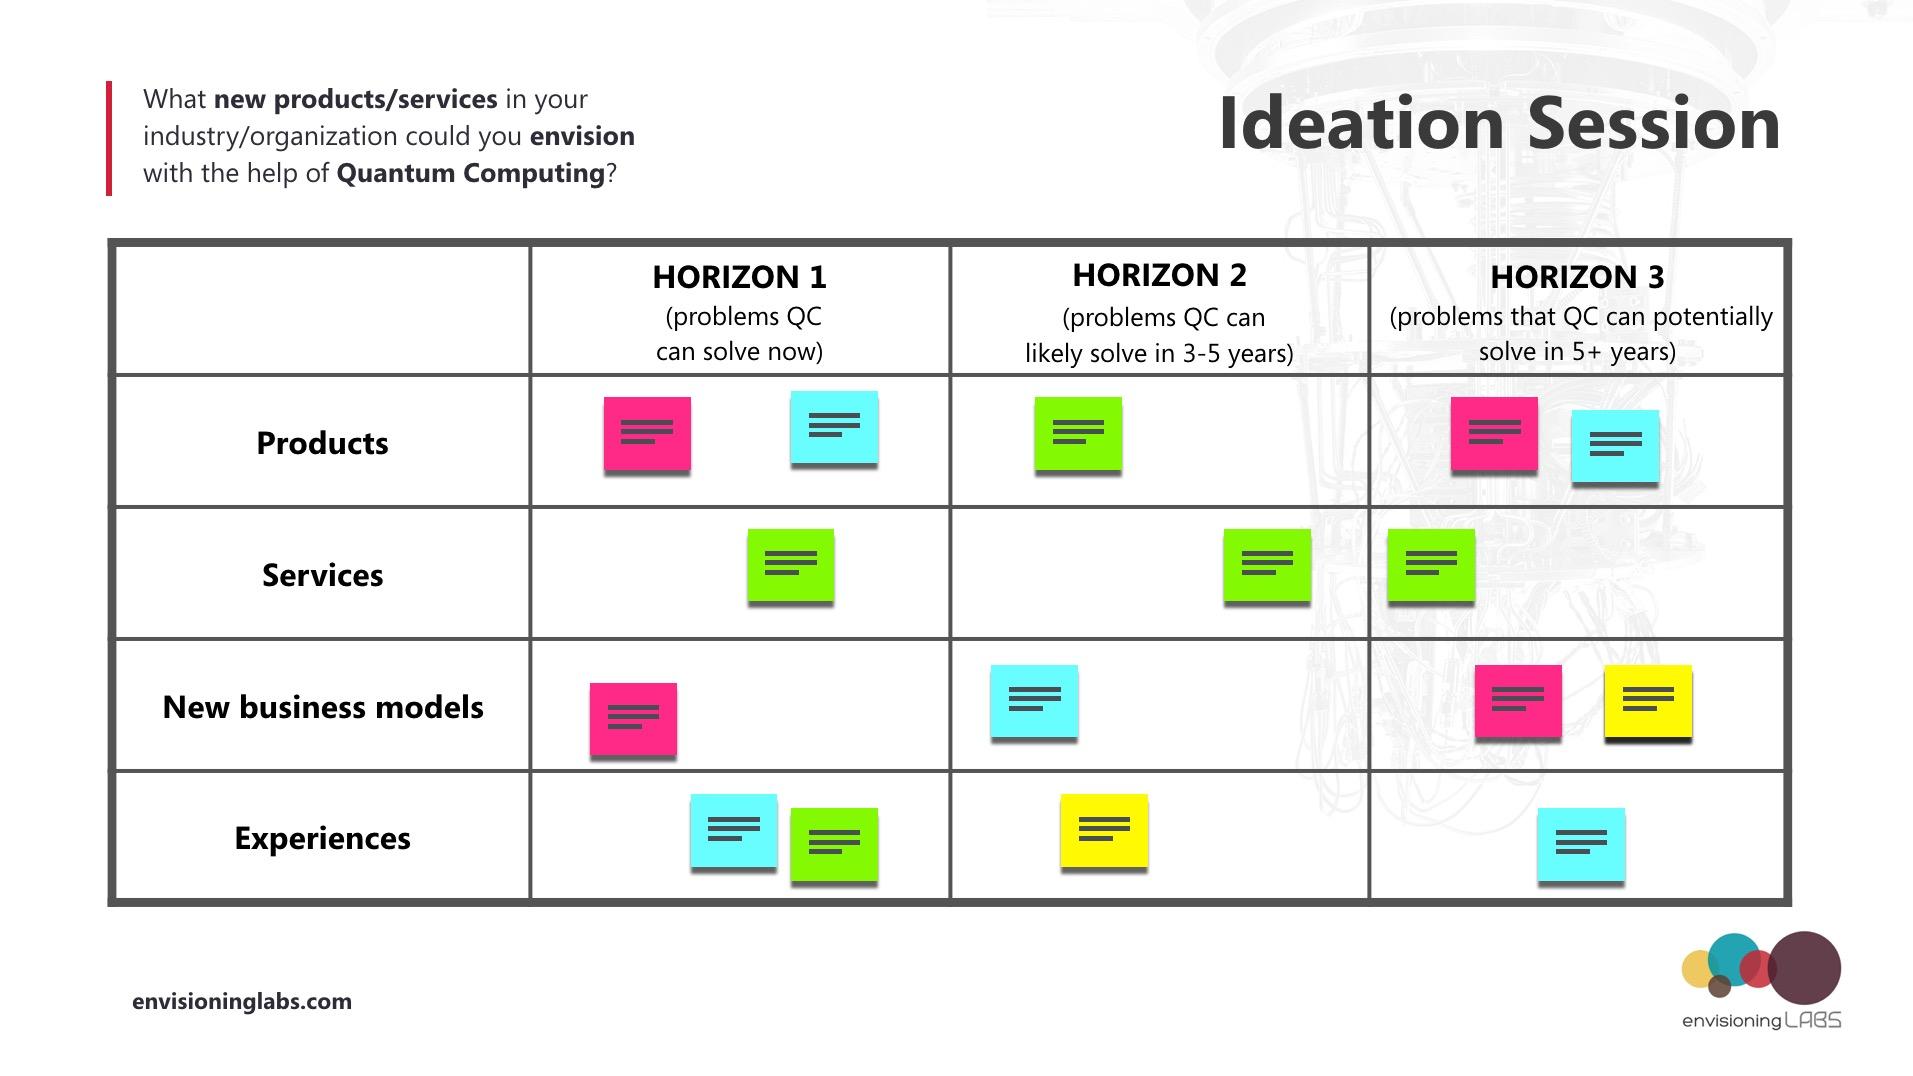 Envisioning Labs Quantum Computing Ideation Dashboard.jpg